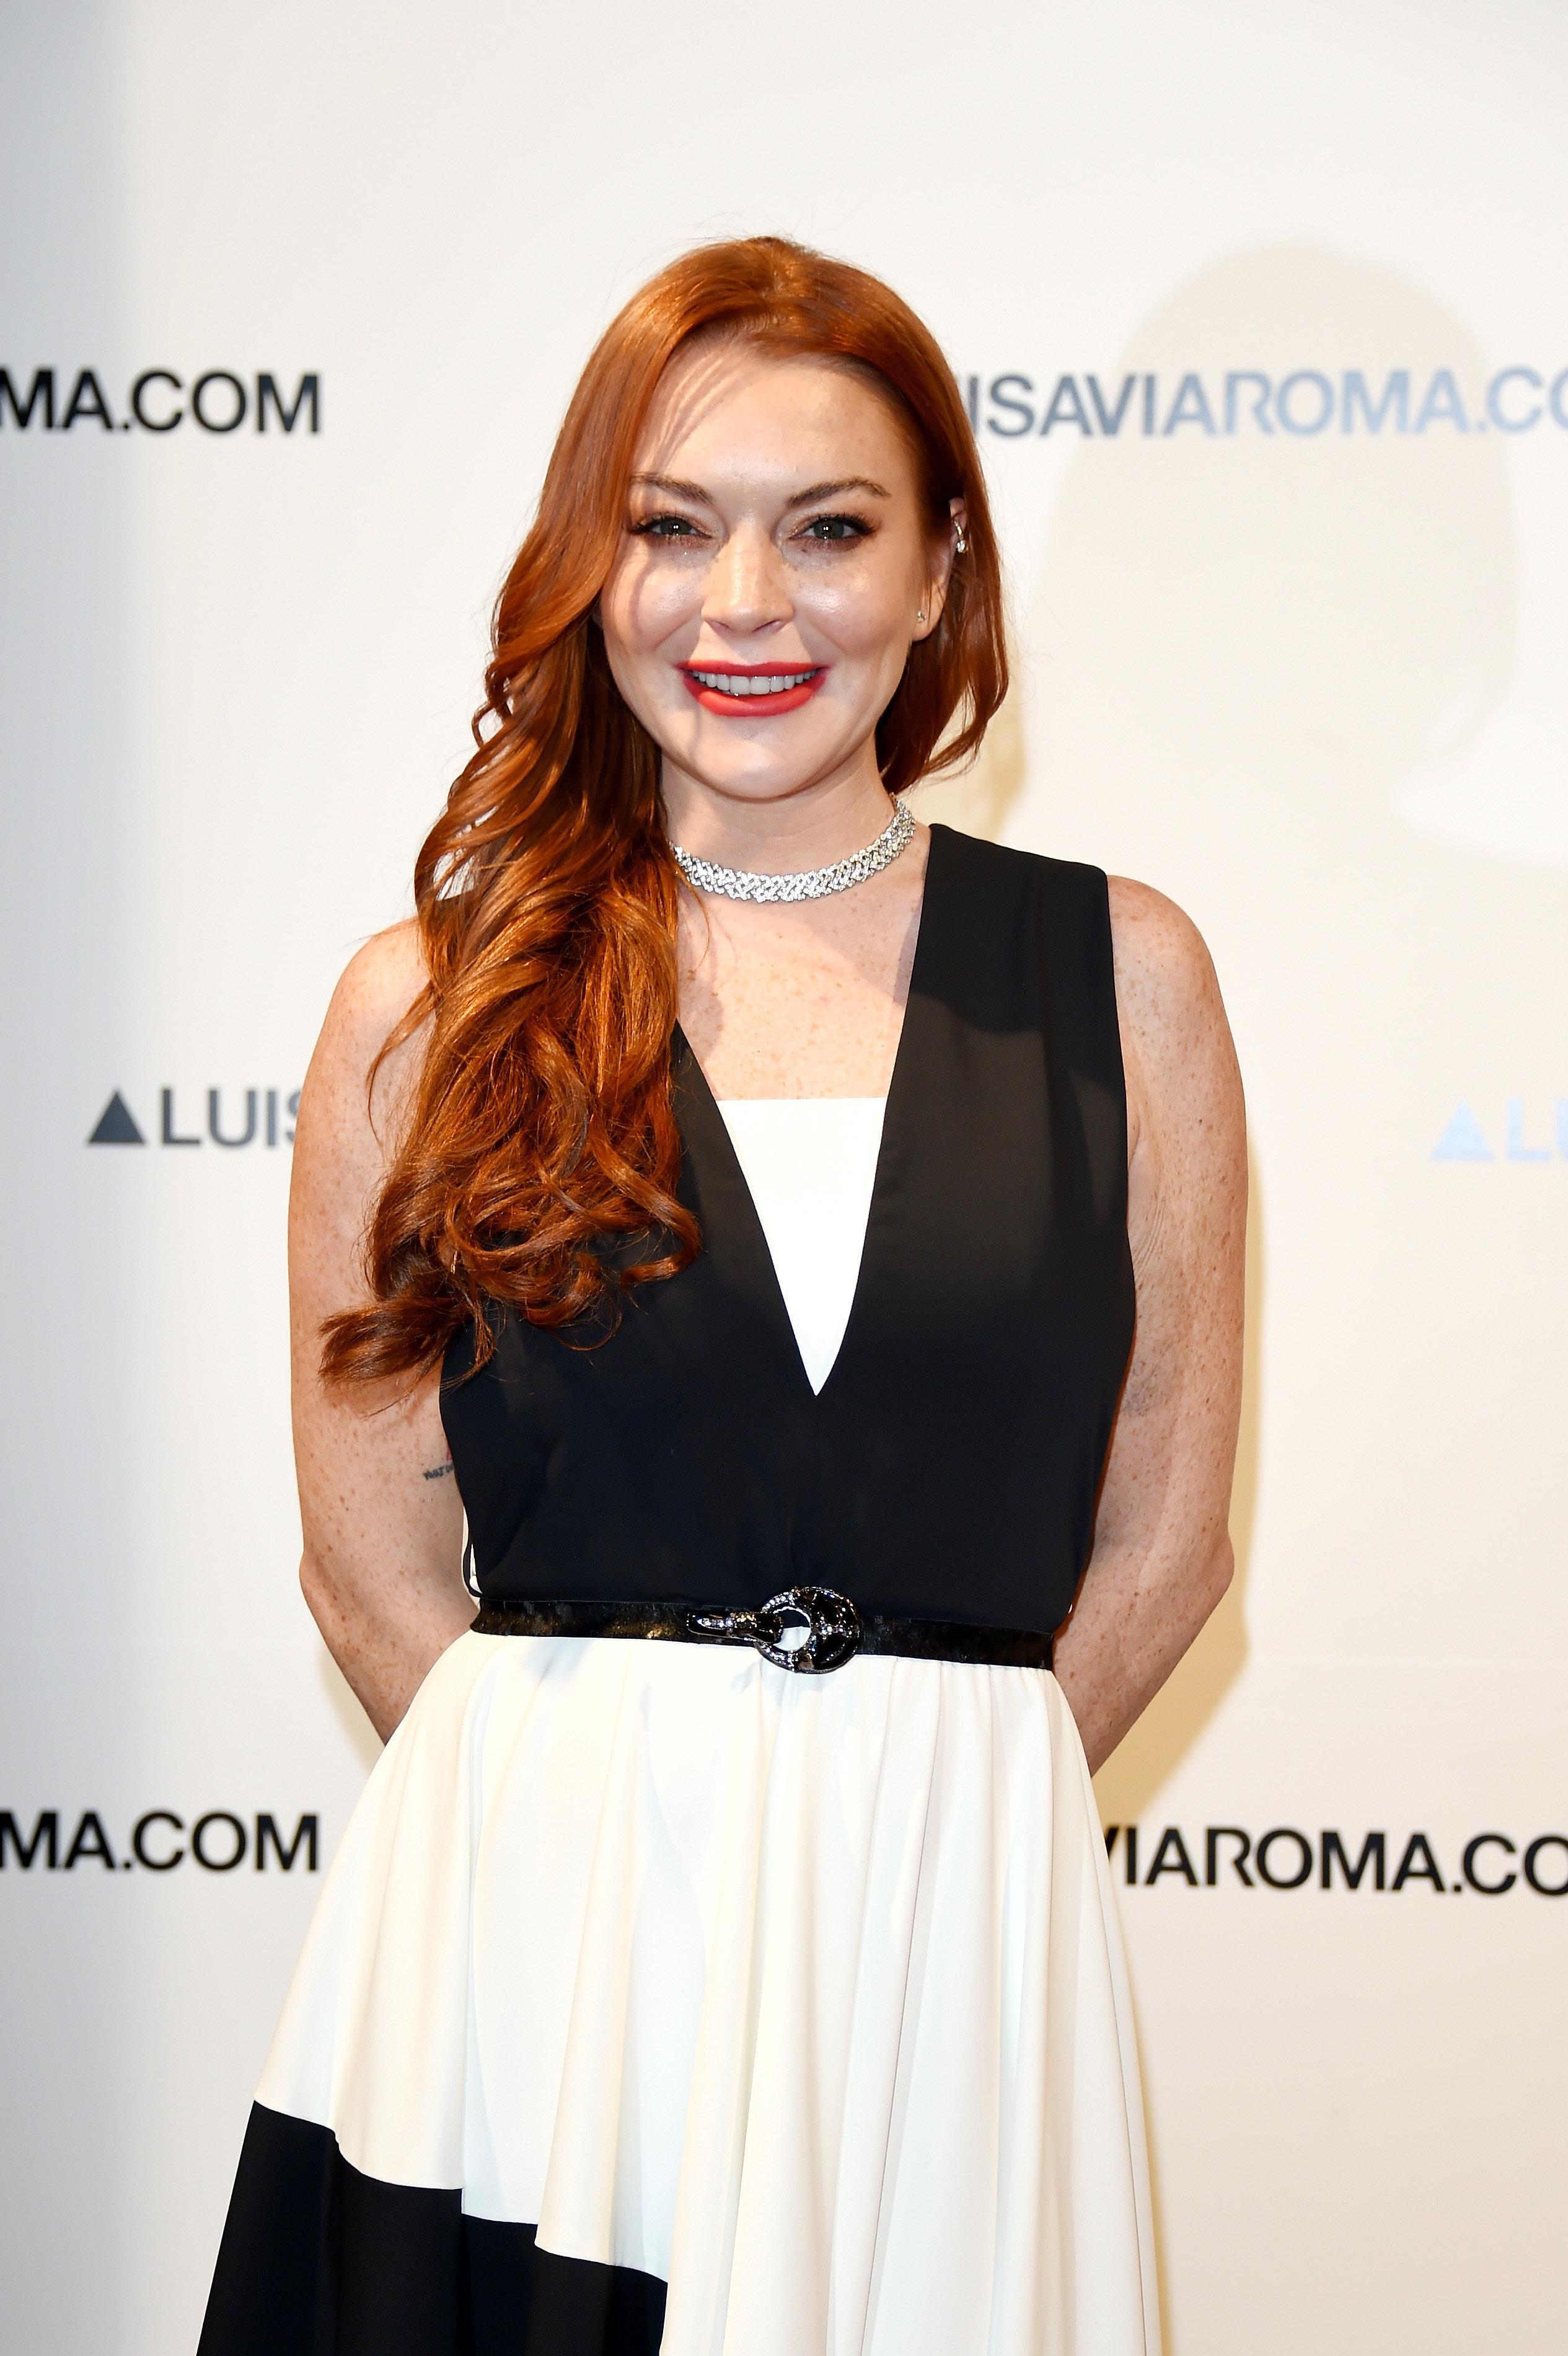 Lindsay Lohan Announces New Role As Fashion